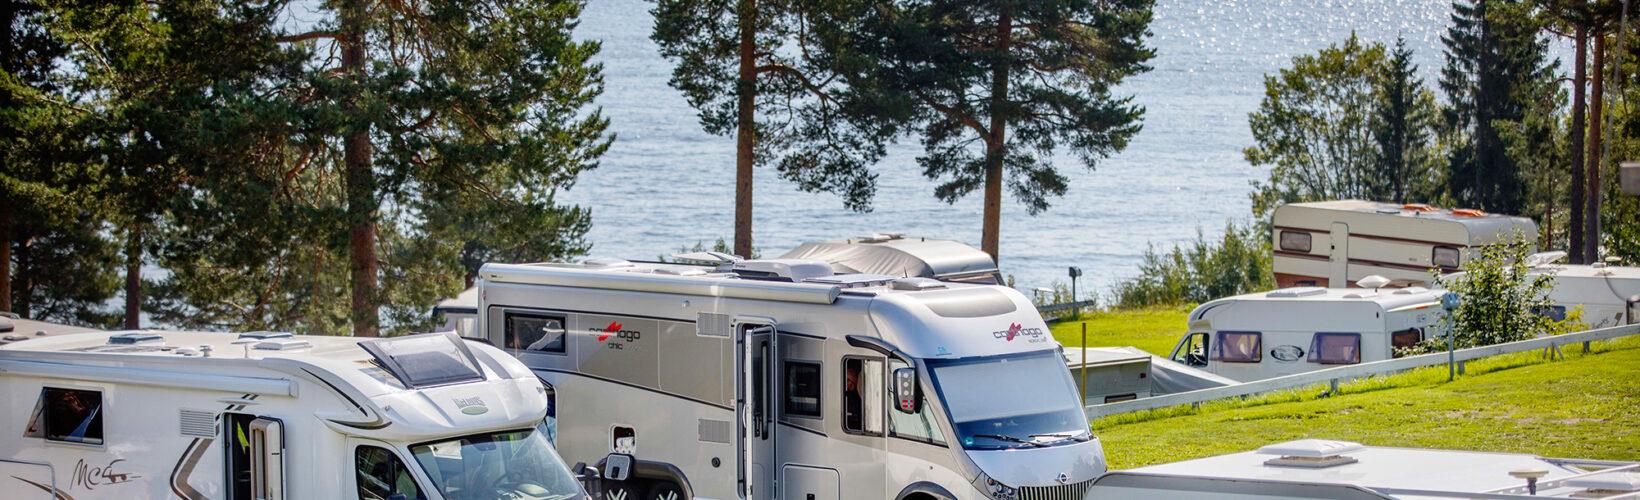 Campingtomt